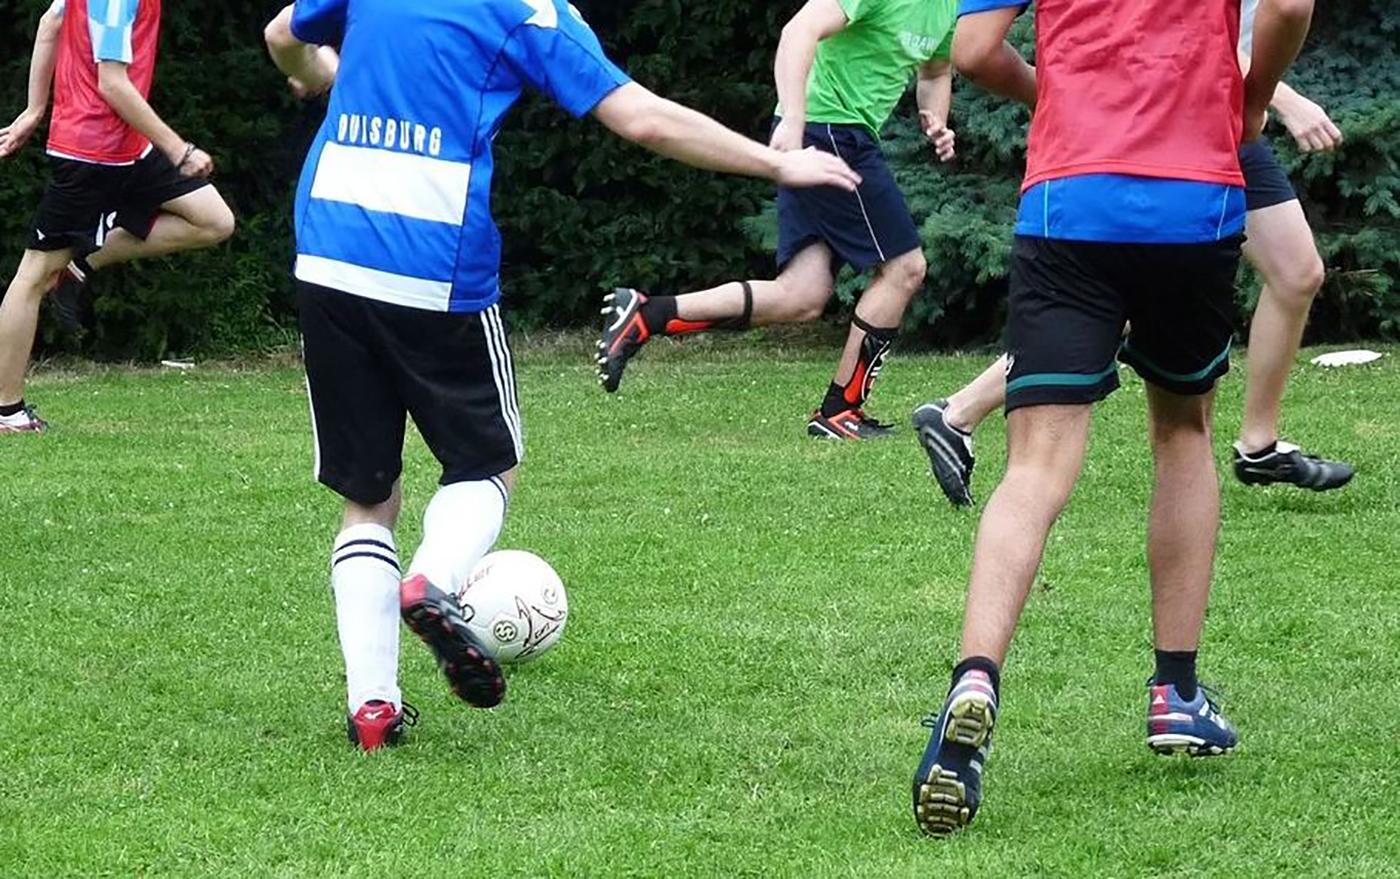 La culture sportive, un capital scolaire